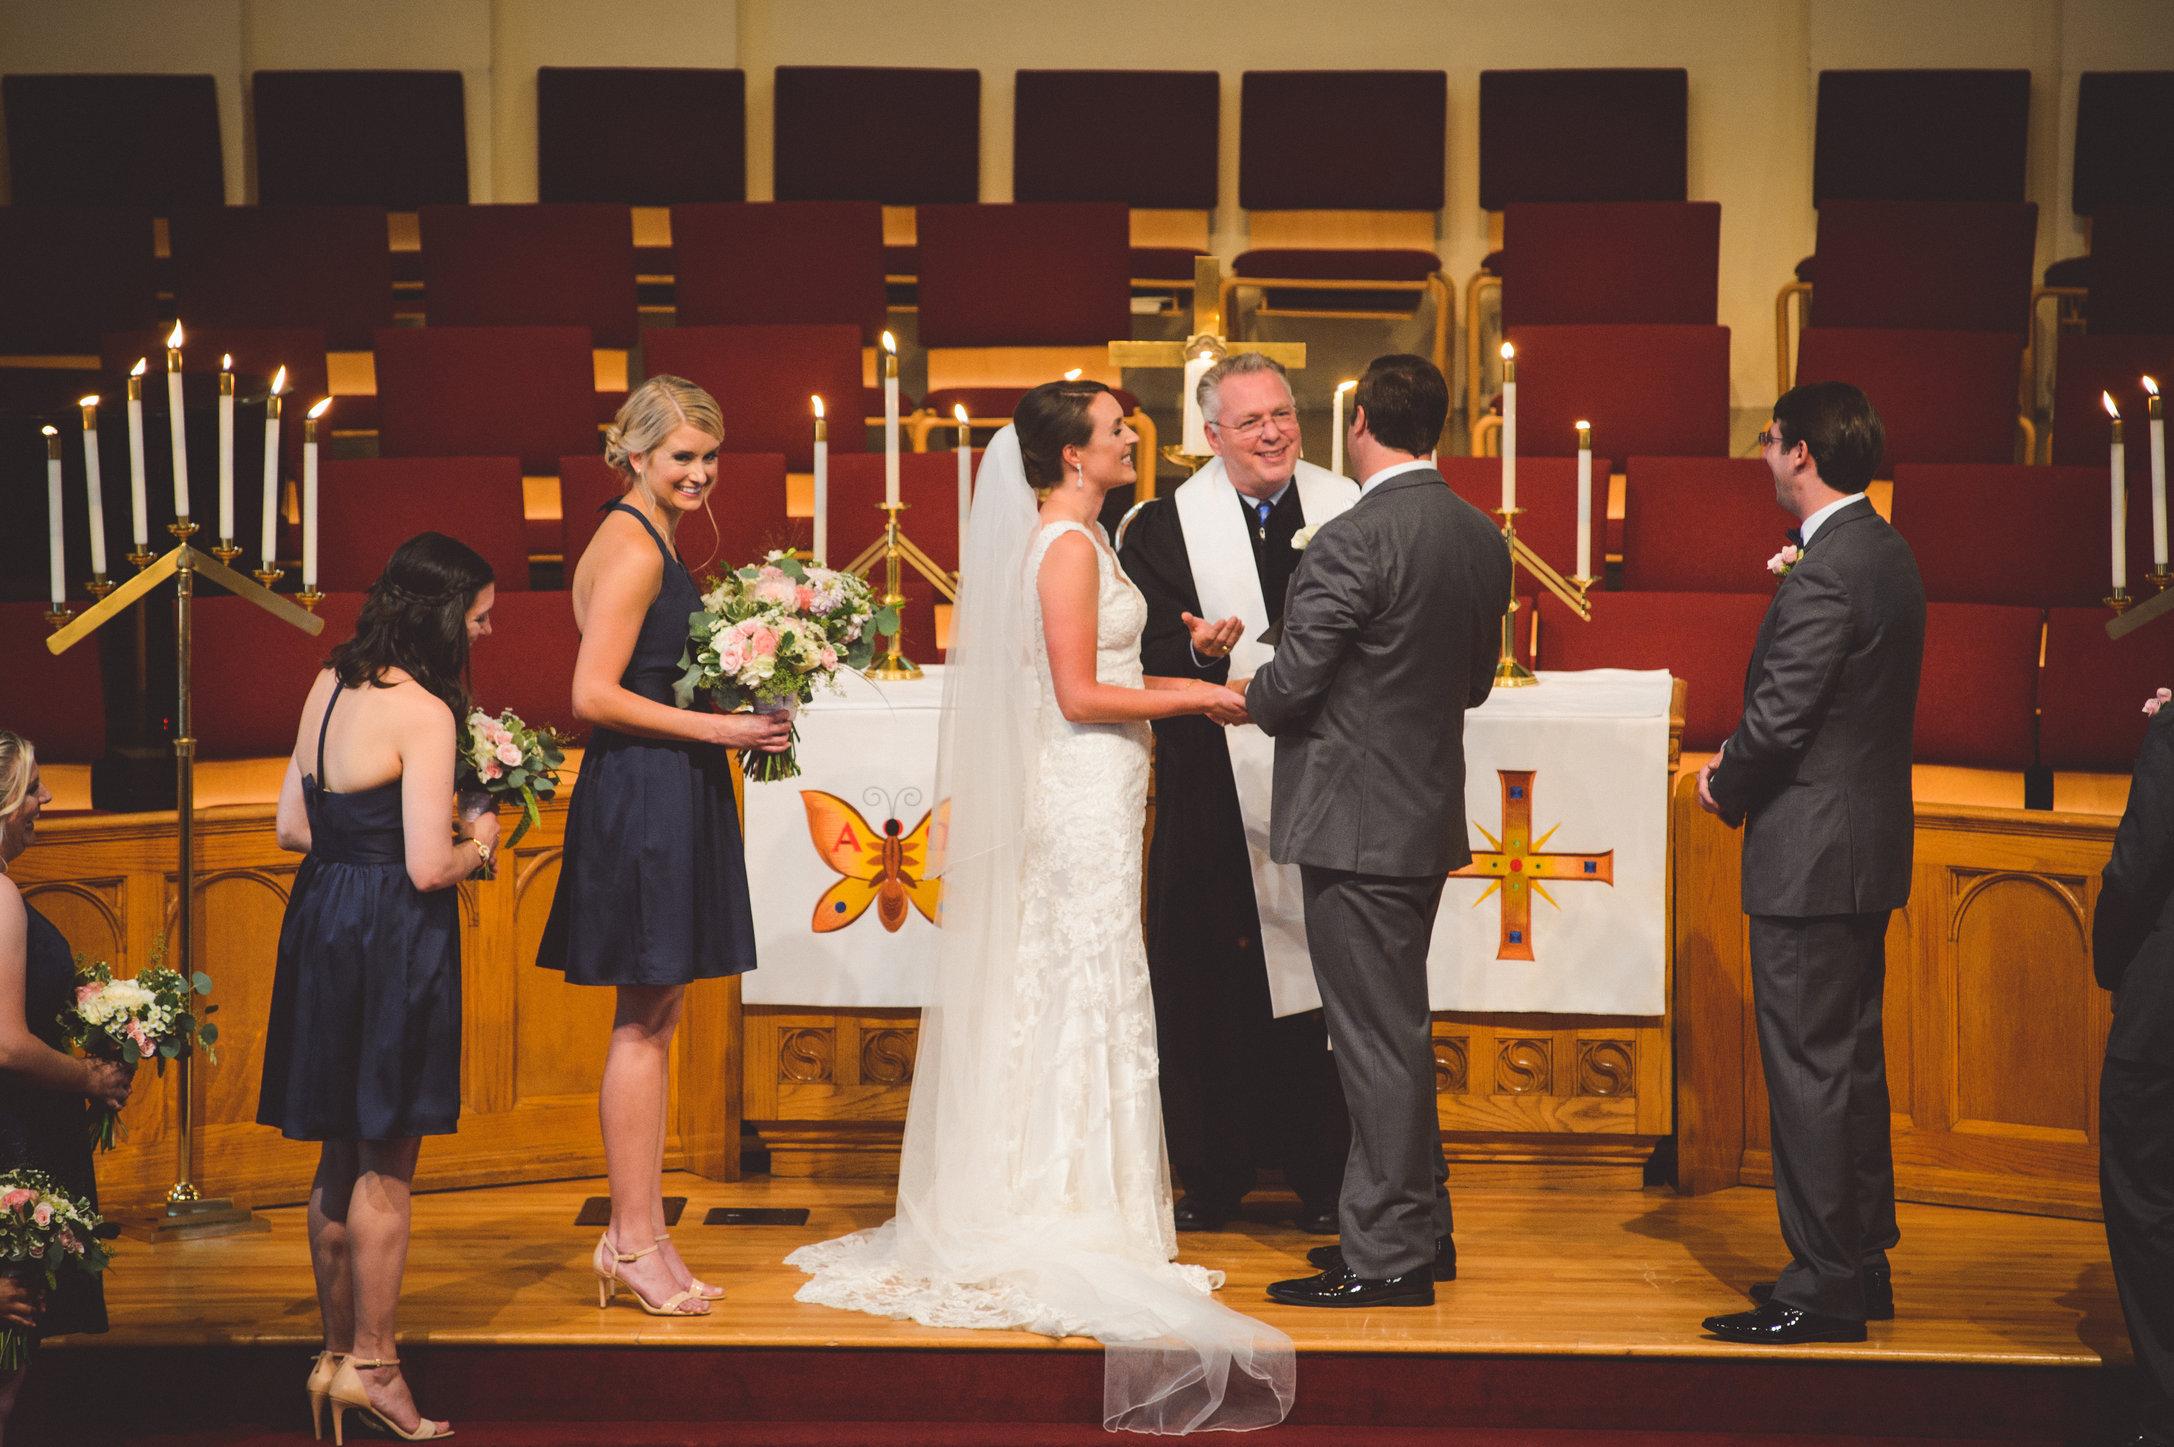 SandC-wedding-208.jpg